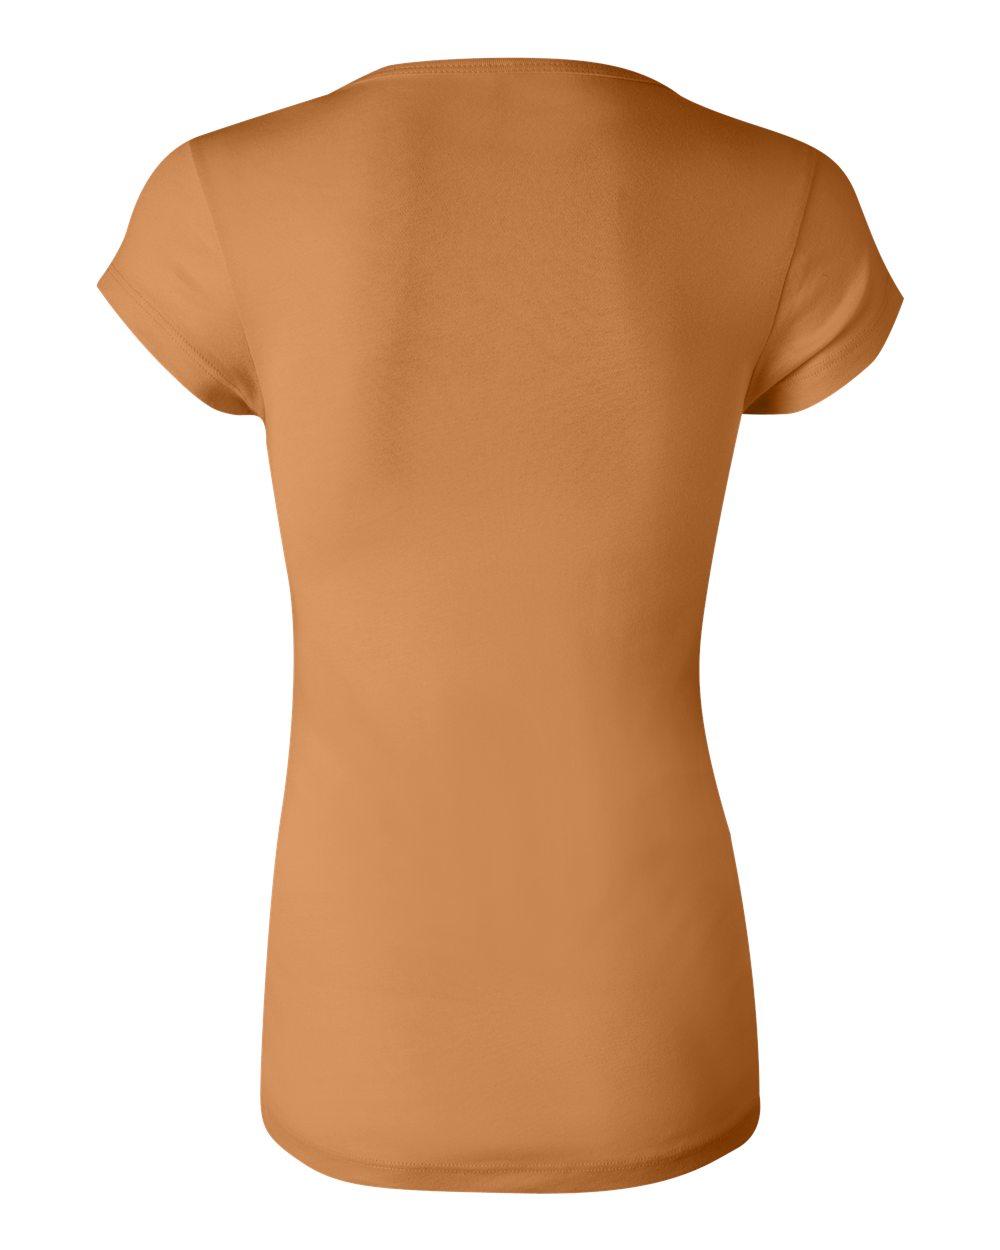 Bella-Canvas-Women-039-s-Sheer-Mini-Rib-Short-Sleeve-Scoop-Neck-T-Shirt-B8703-S-2XL thumbnail 25